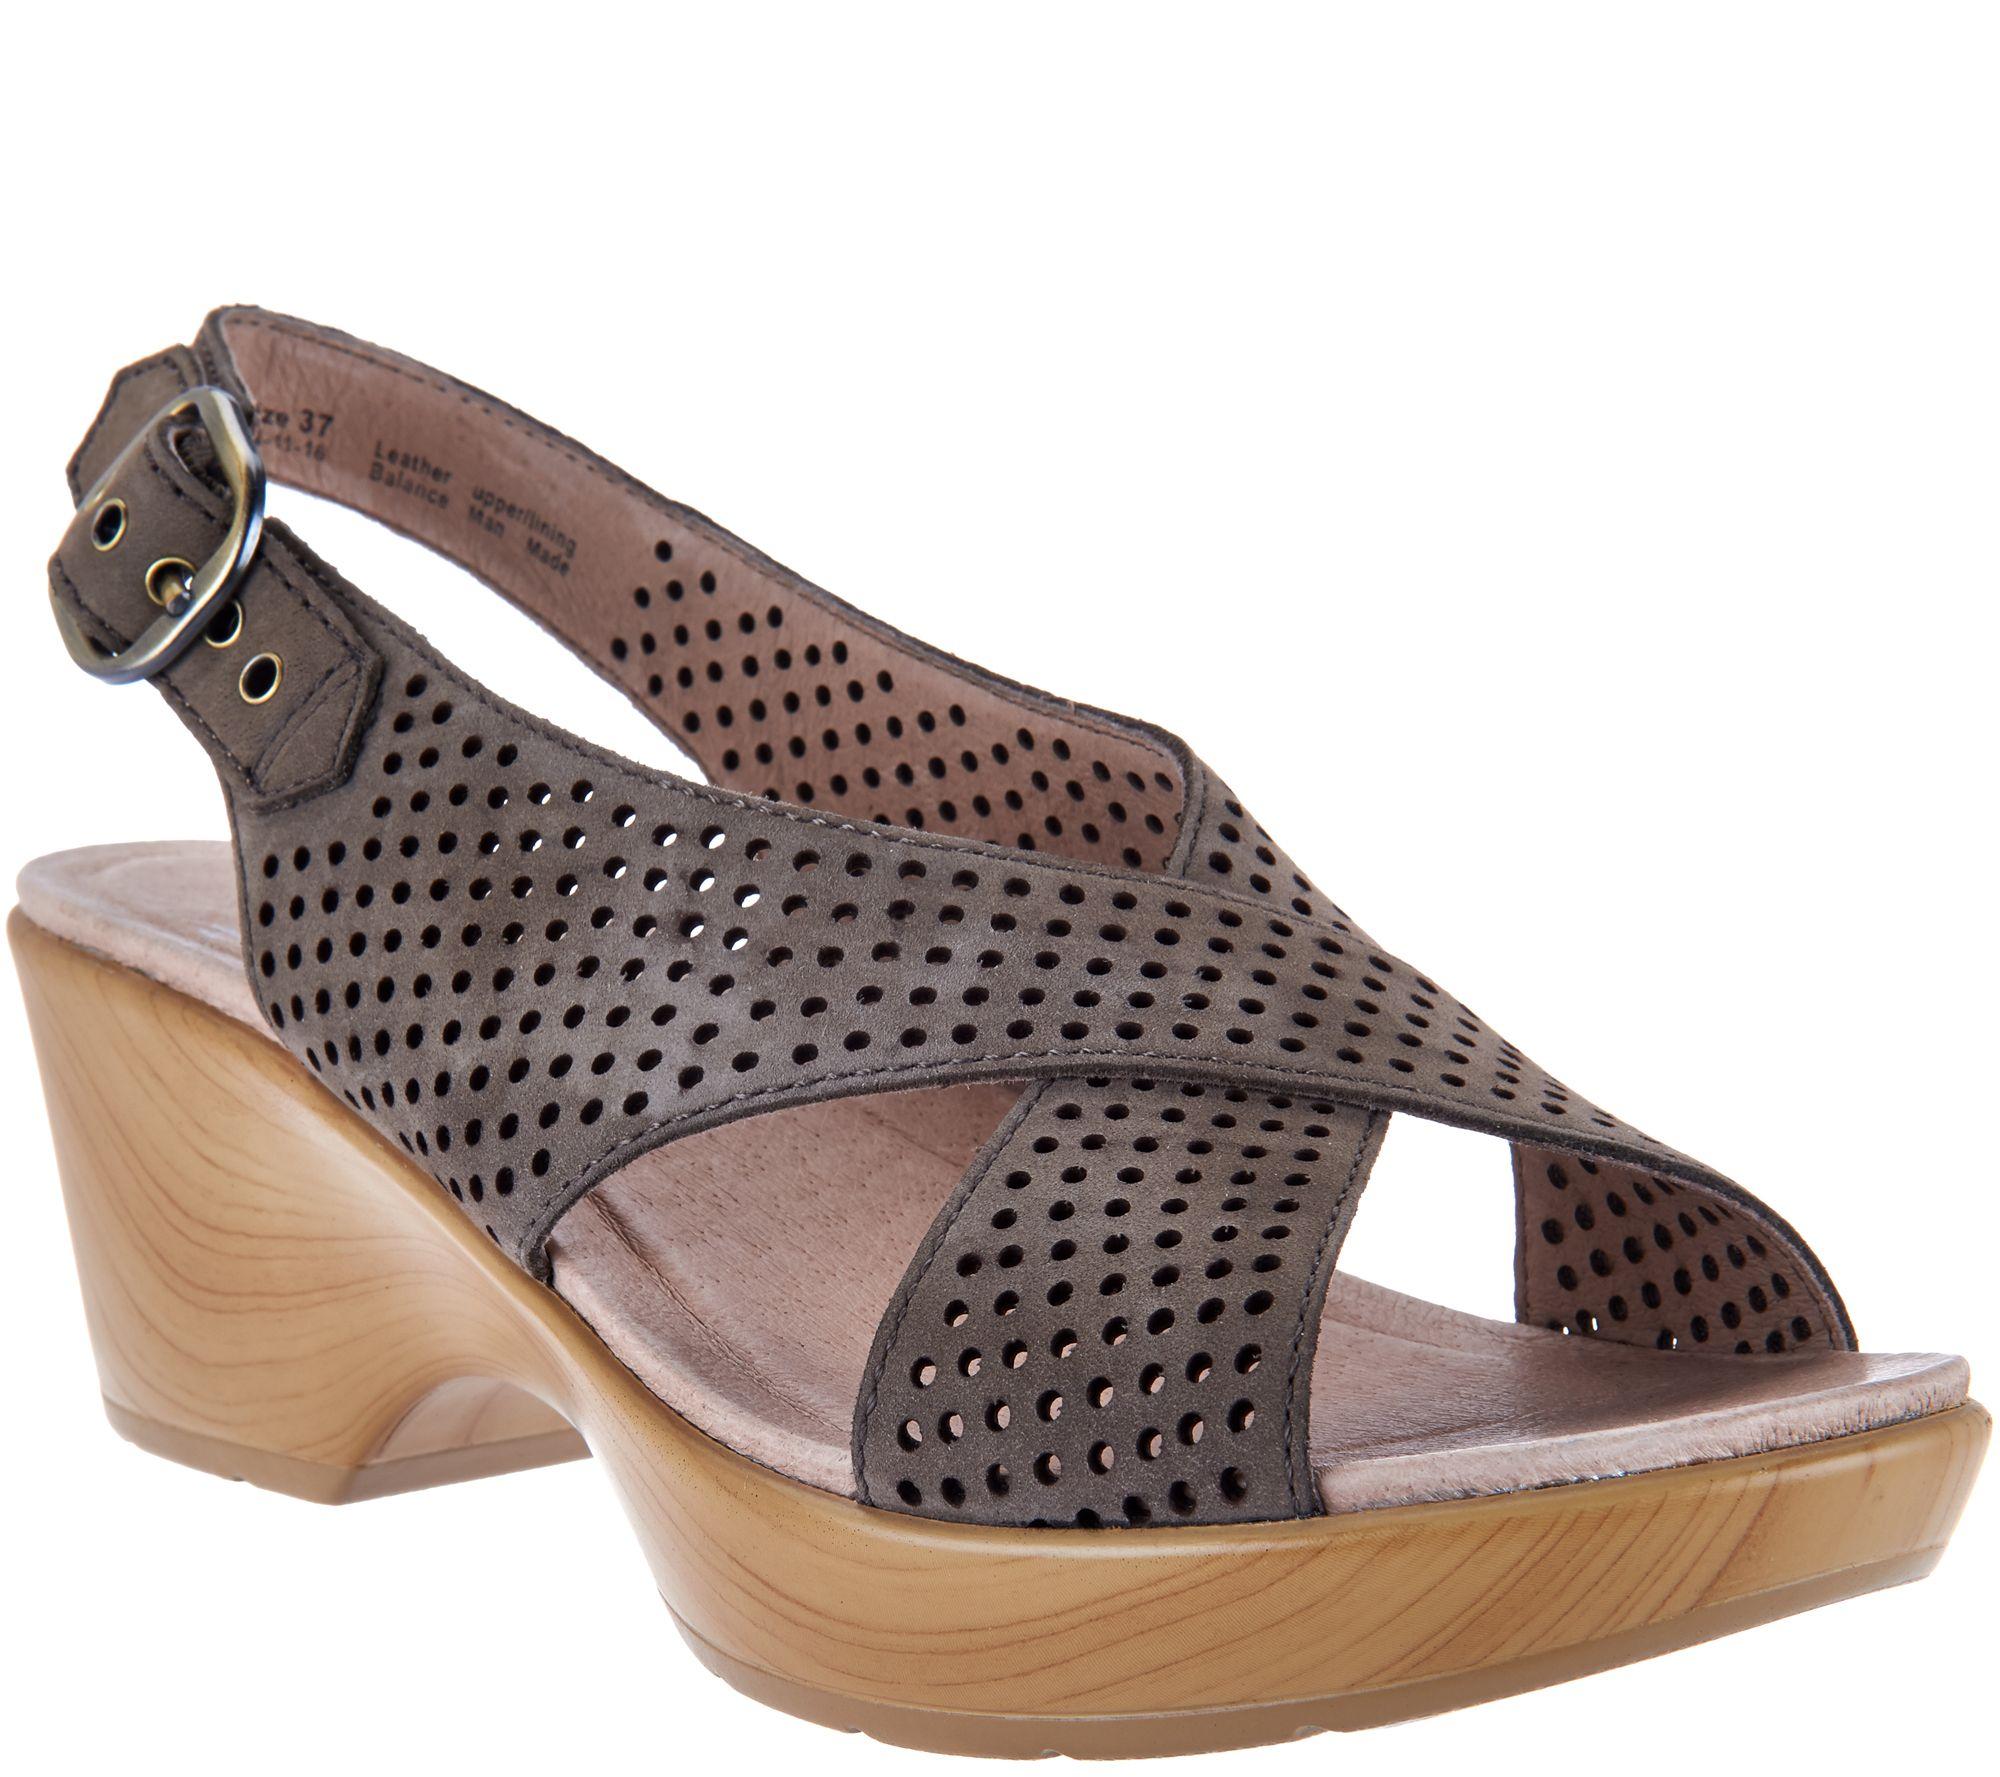 668cd242b98f Dansko Nubuck Leather Perforated Sandals - Jacinda - Page 1 — QVC.com